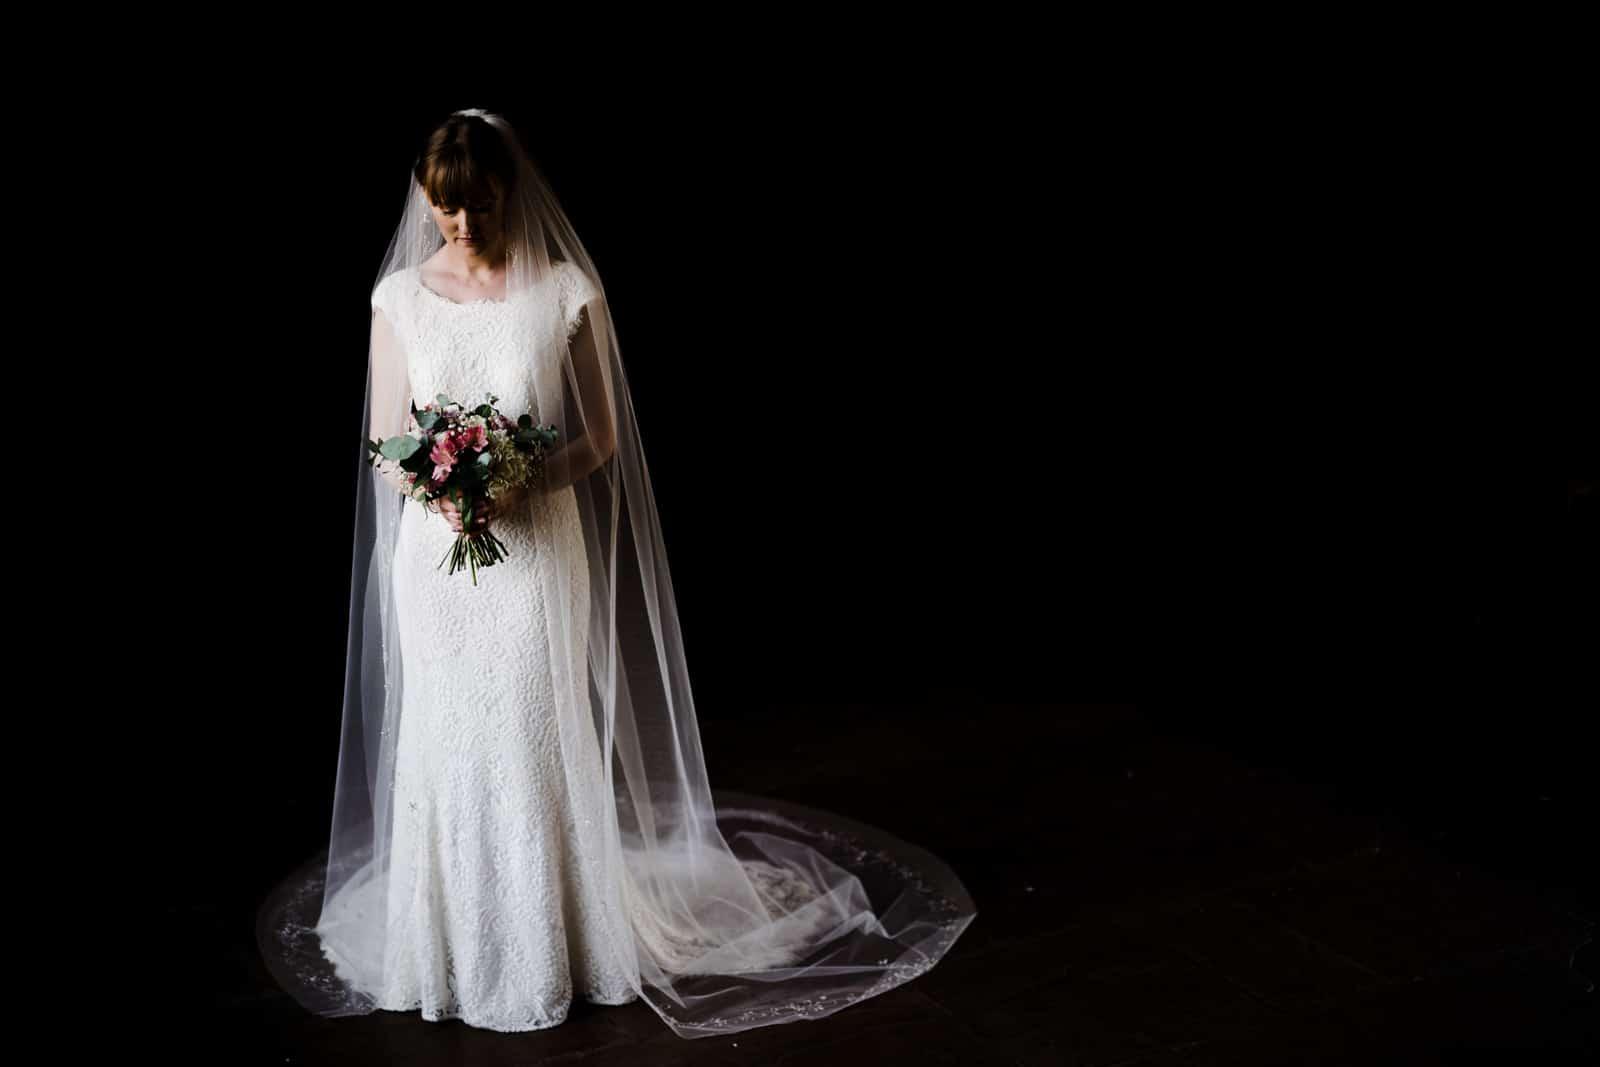 Wedding Photographer Rutland shooting a bride at Dodfod manor